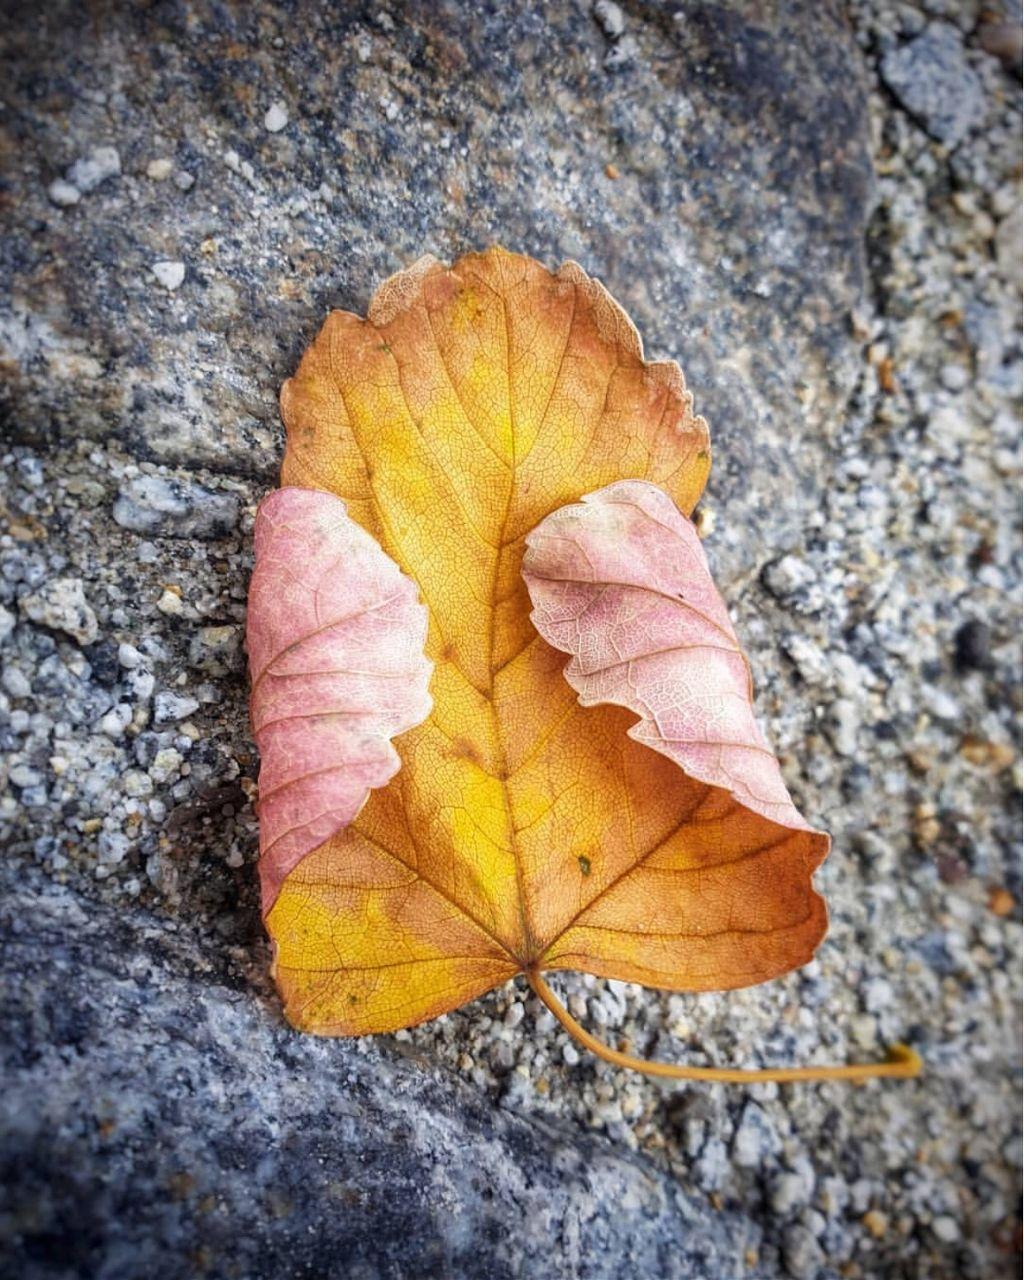 Self hug...                                                                                   On #mywayhome I #found a #leaf on the #ground #autumnfeels #autumnvibes 🍂 #textures #grungerextures #texturesinnature #minimal #urbannaturephotography                                                                #freetoedit